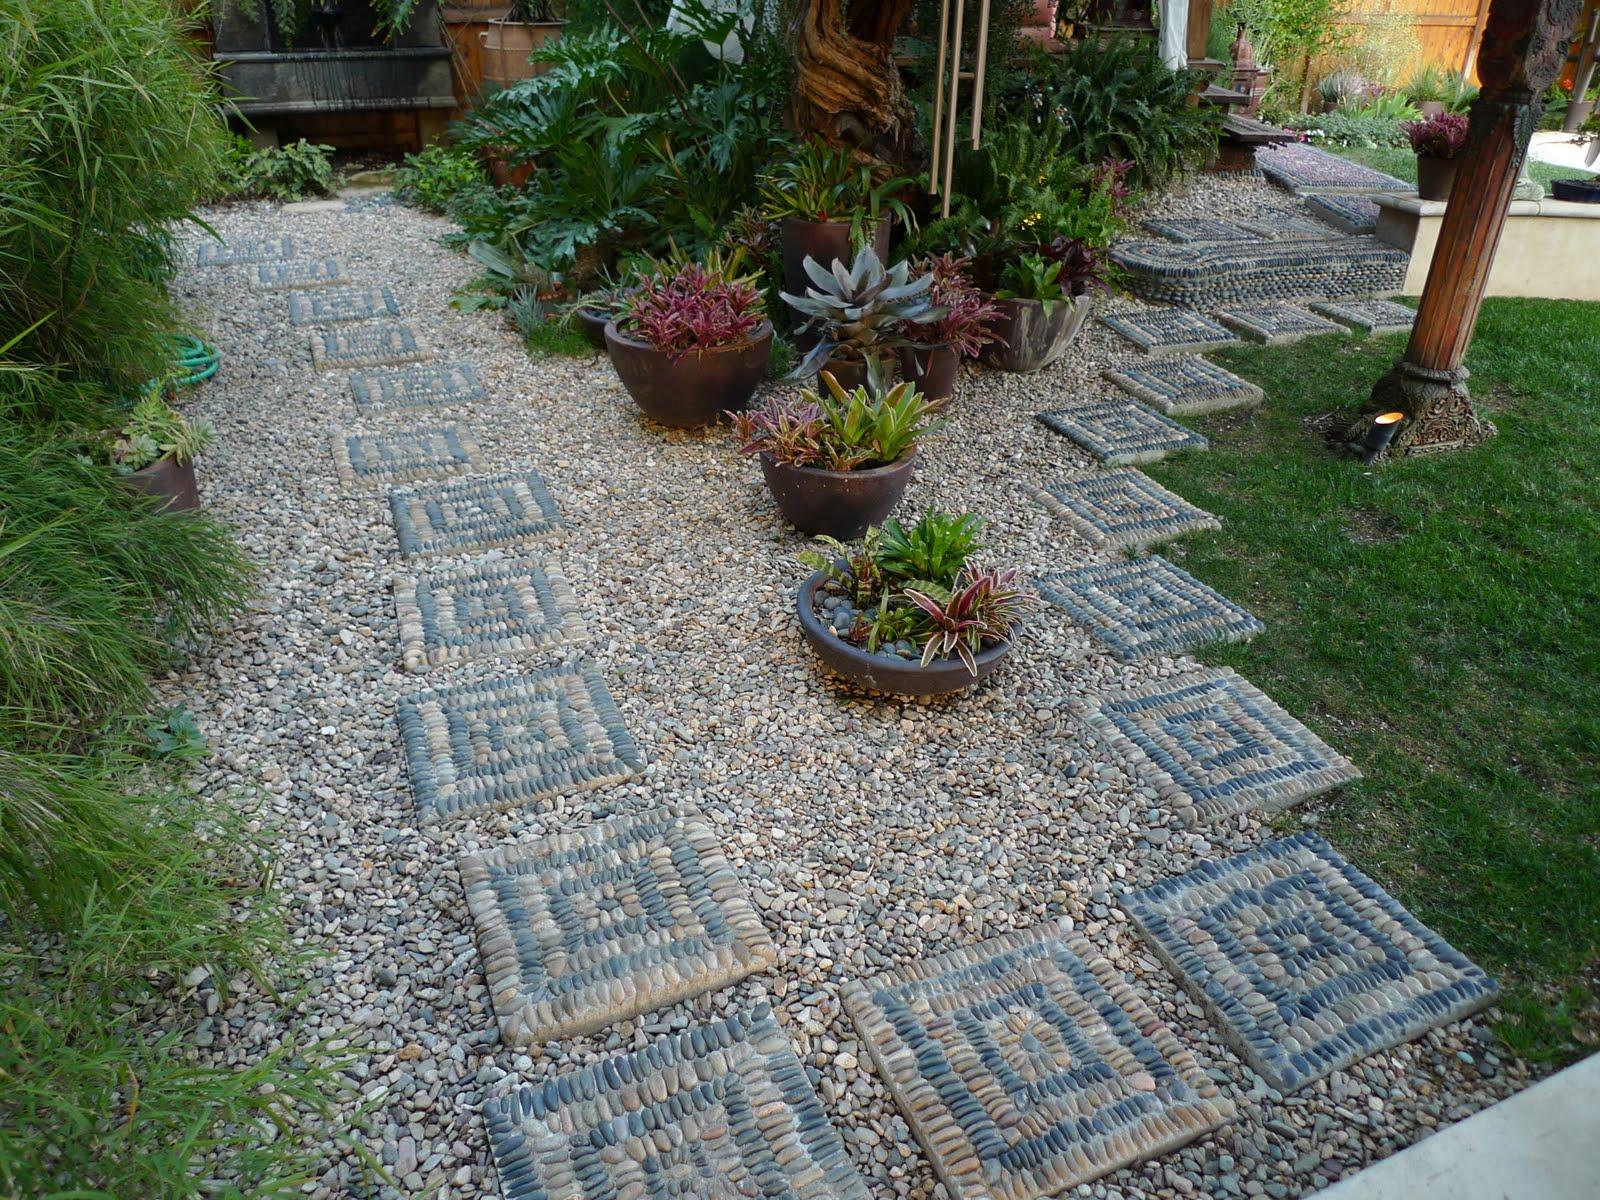 Jeffrey Bale's World Of Gardens: Building A Pebble Mosaic